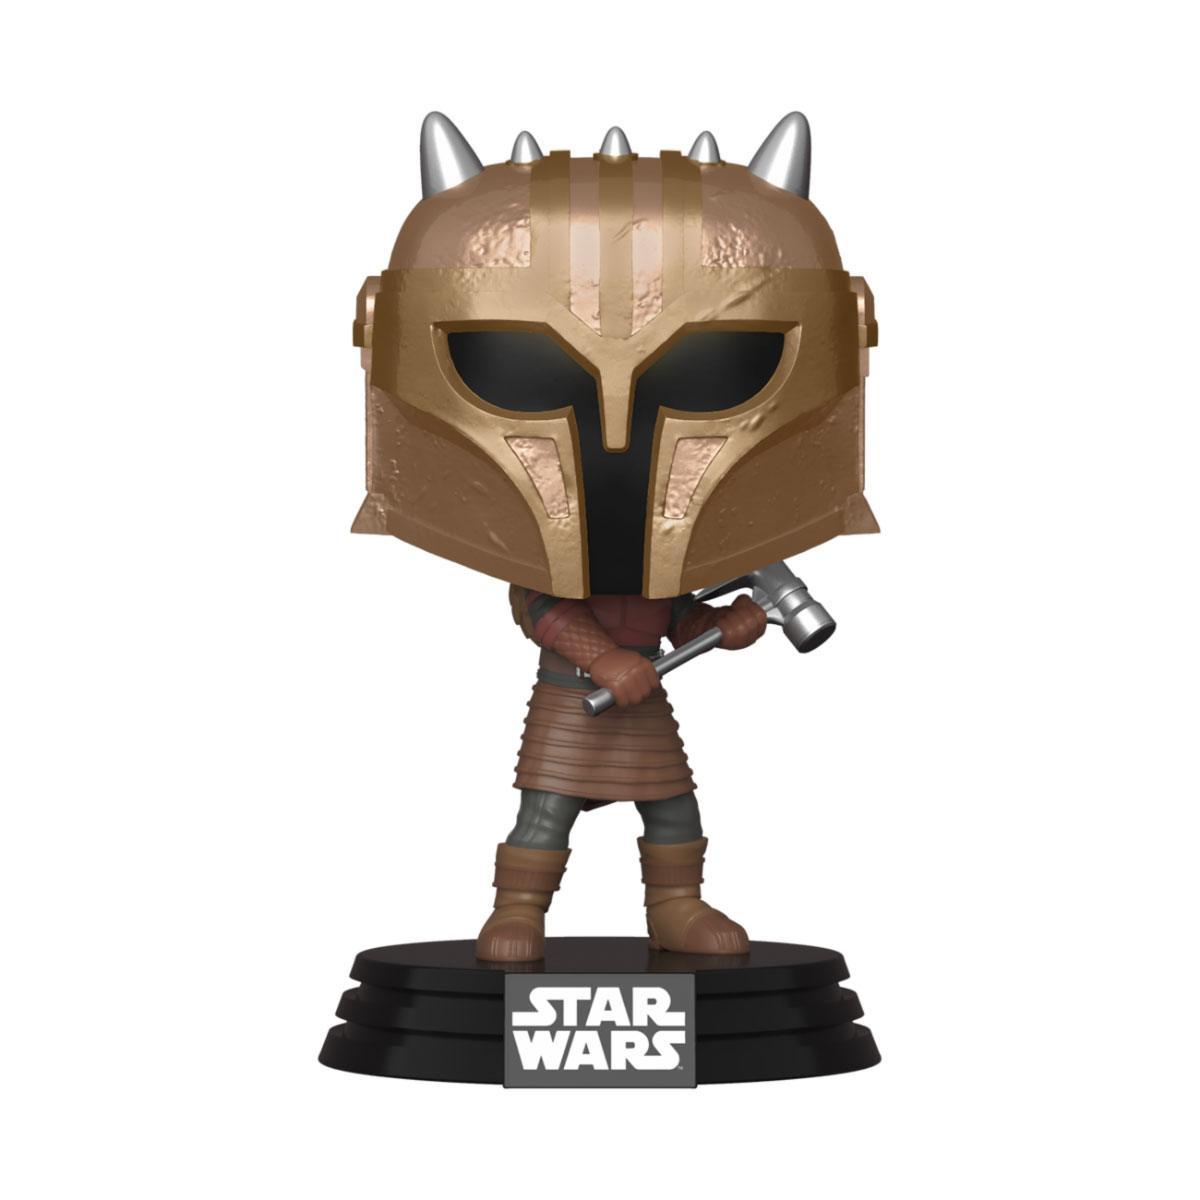 Funko POP! Star Wars: Mandalorian - The Armor Vinyl Figure 10cm